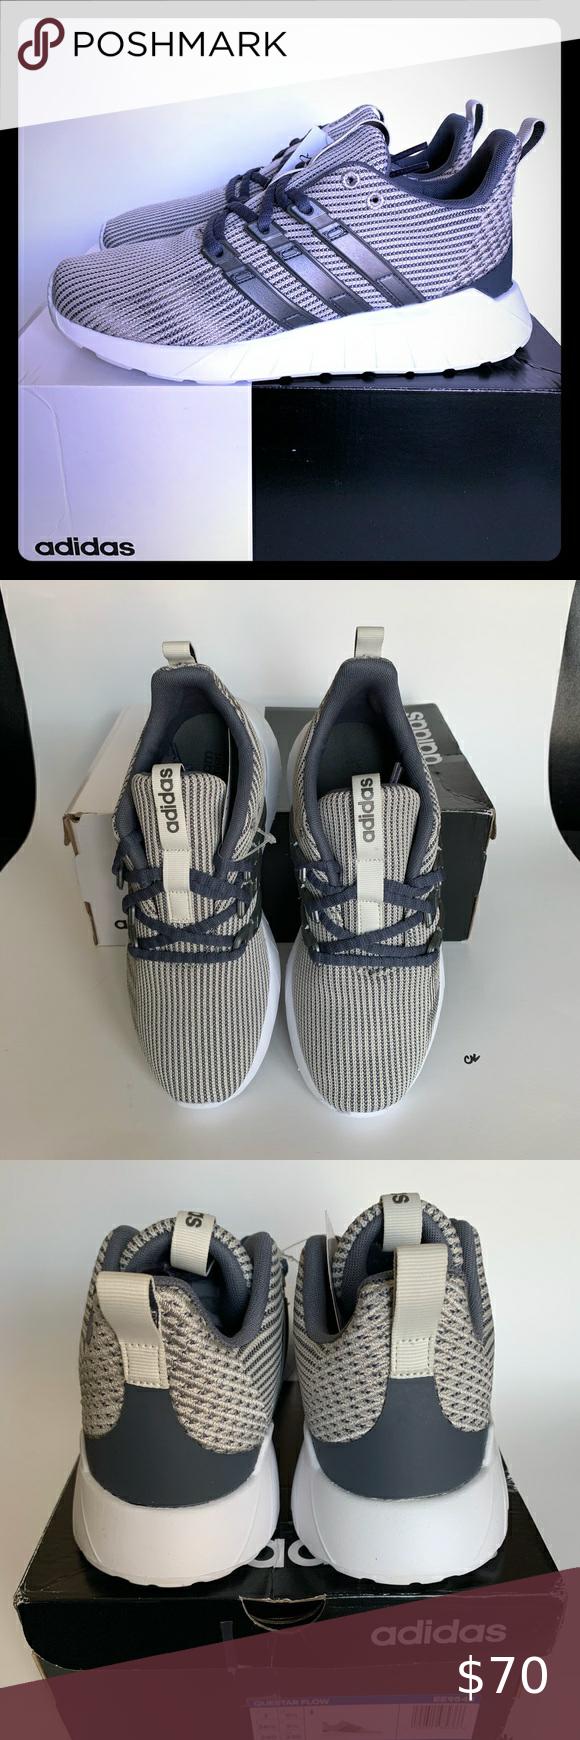 ADIDAS Women's (Size 6) Questar Flow Sneakers | Adidas women ...